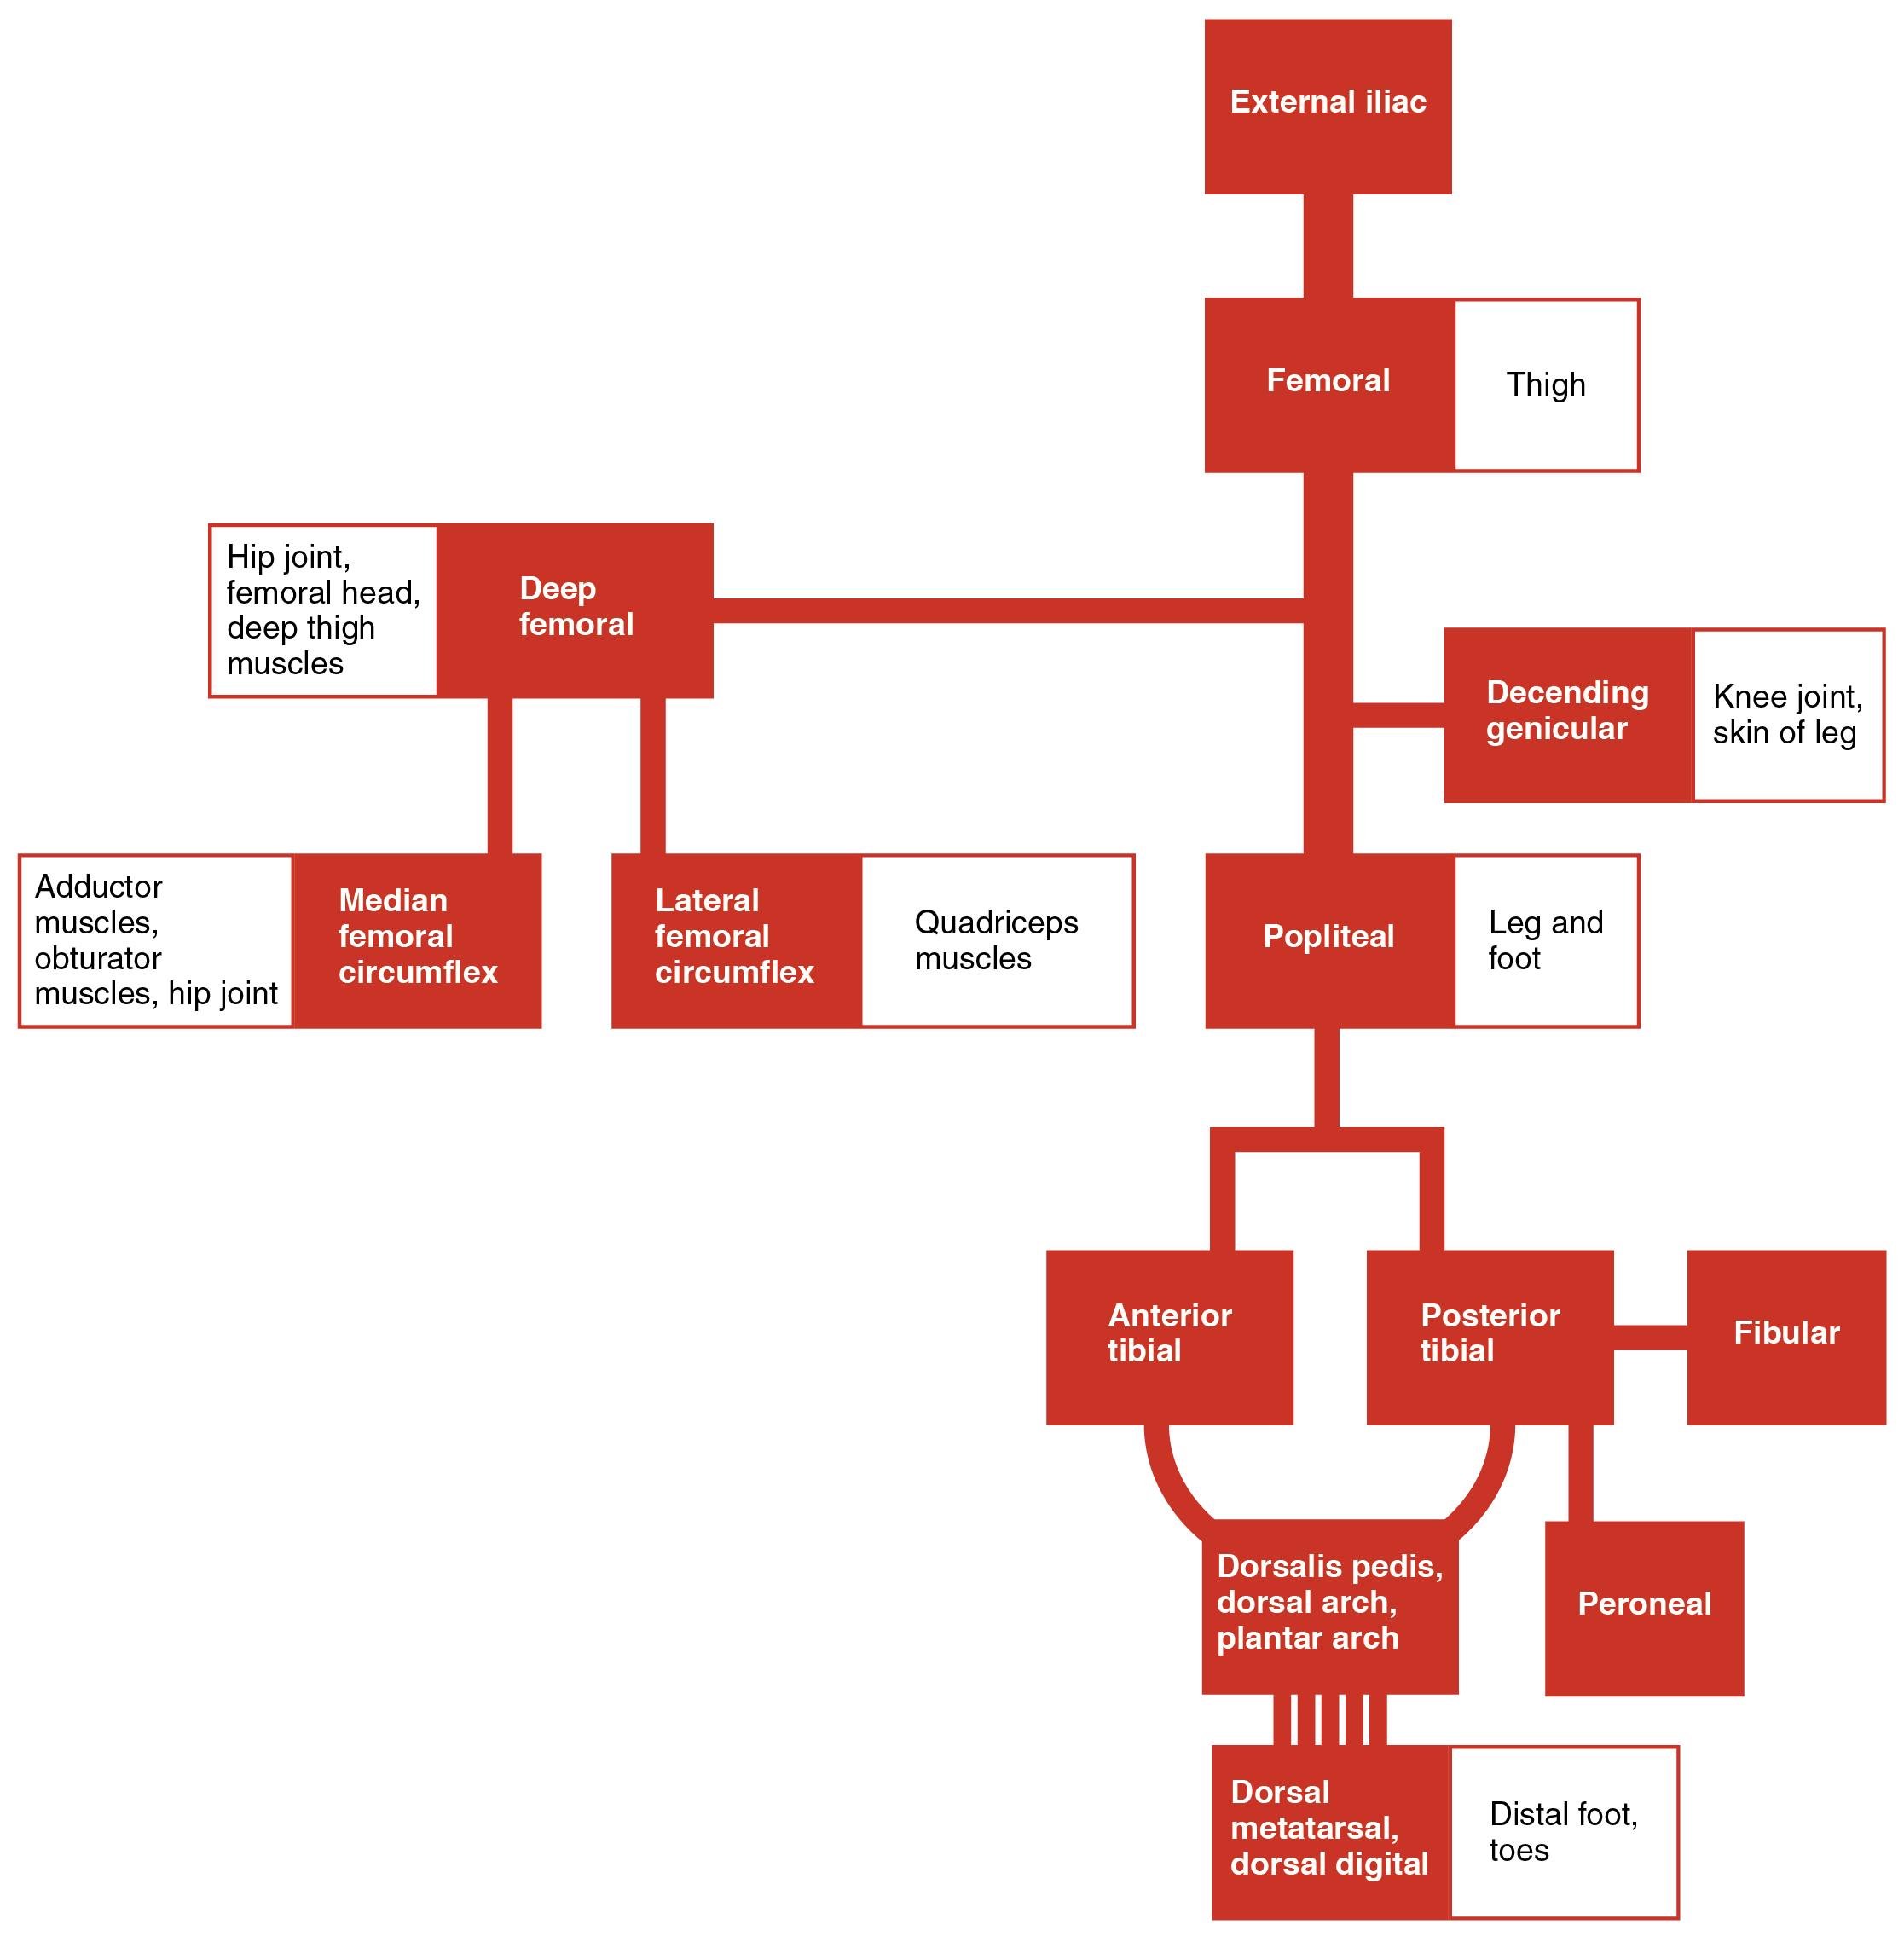 Flow Chart Of Blood: 2130 Lower Limb Arteries Chart.jpg - Wikimedia Commons,Chart